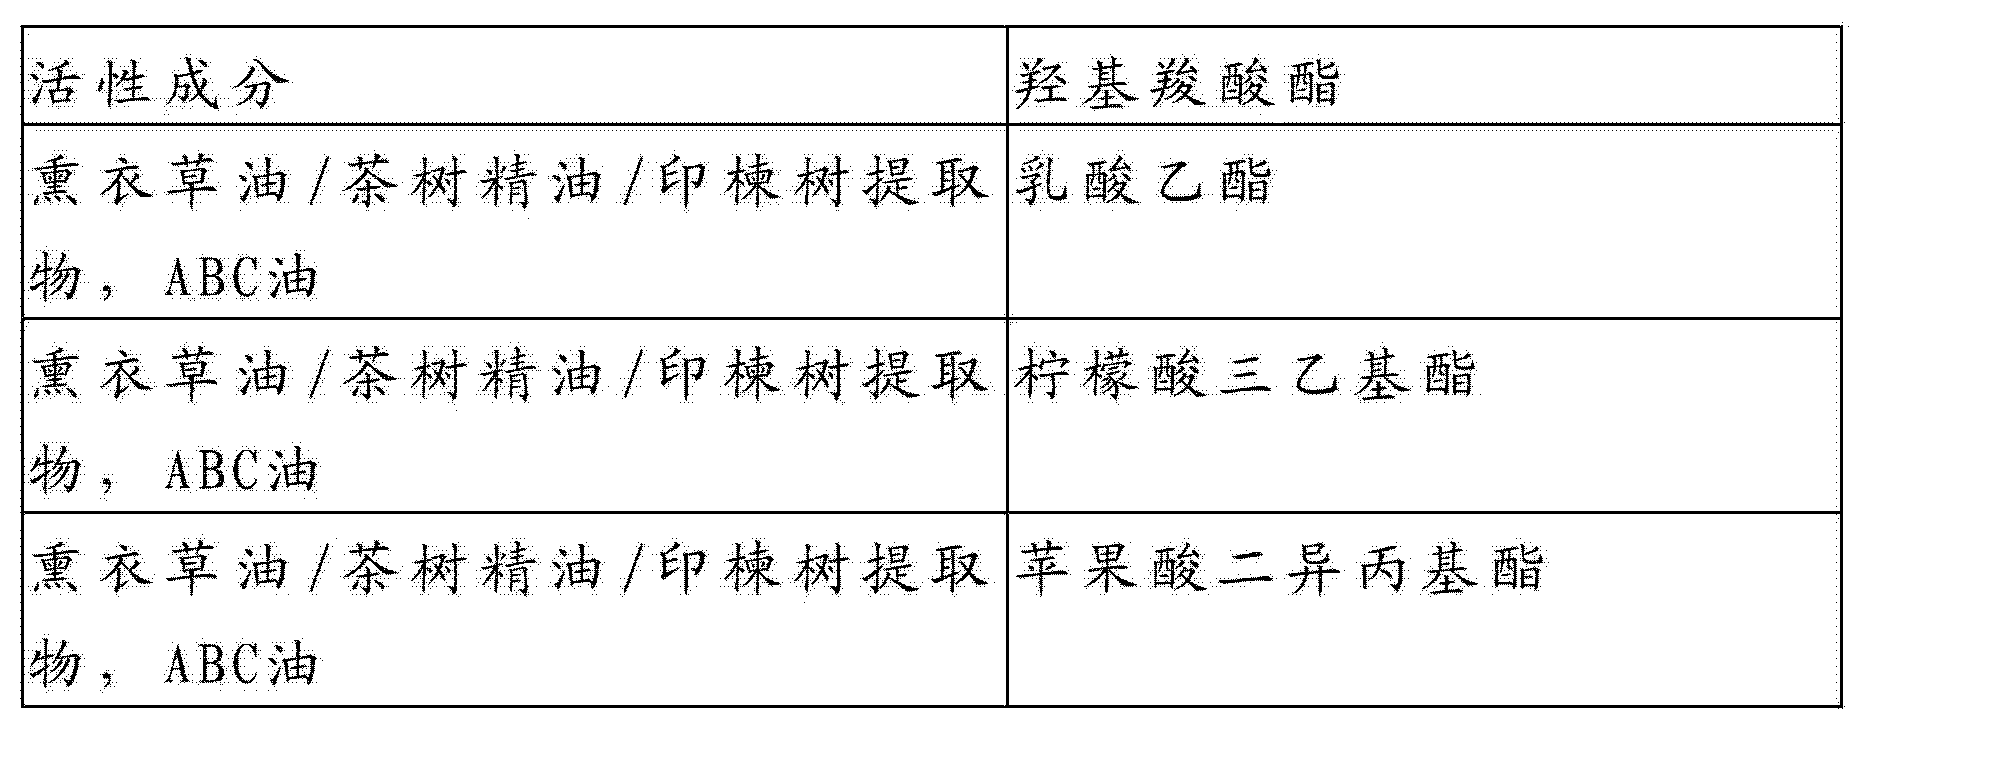 Figure CN103357015AD00172